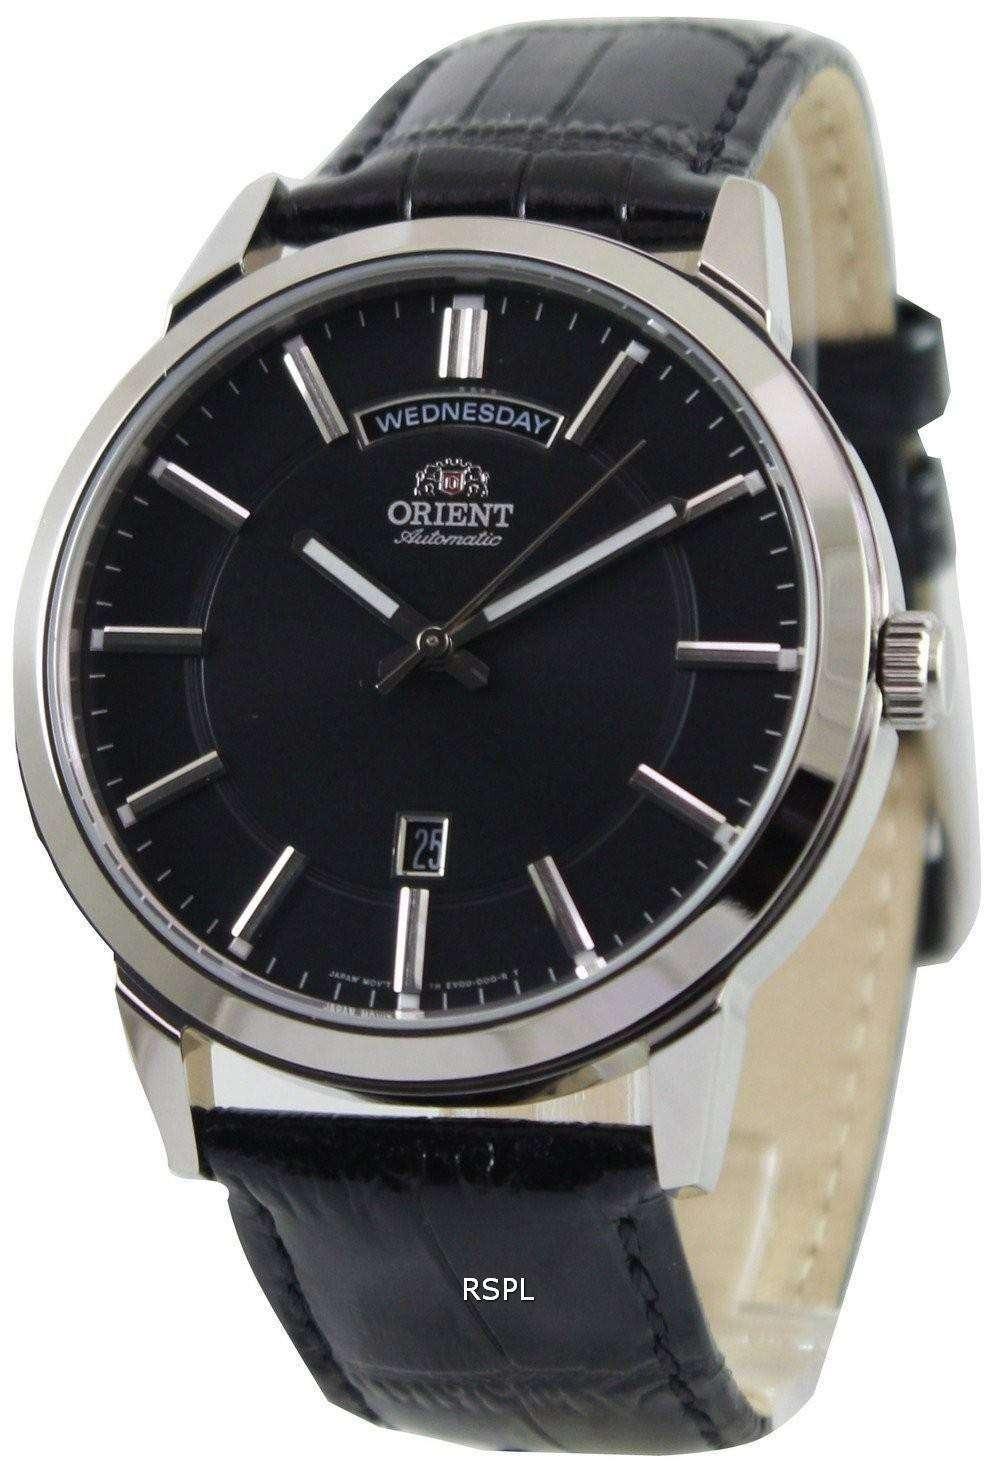 orient classic automatic black dial fev0u003b mens watch. Black Bedroom Furniture Sets. Home Design Ideas